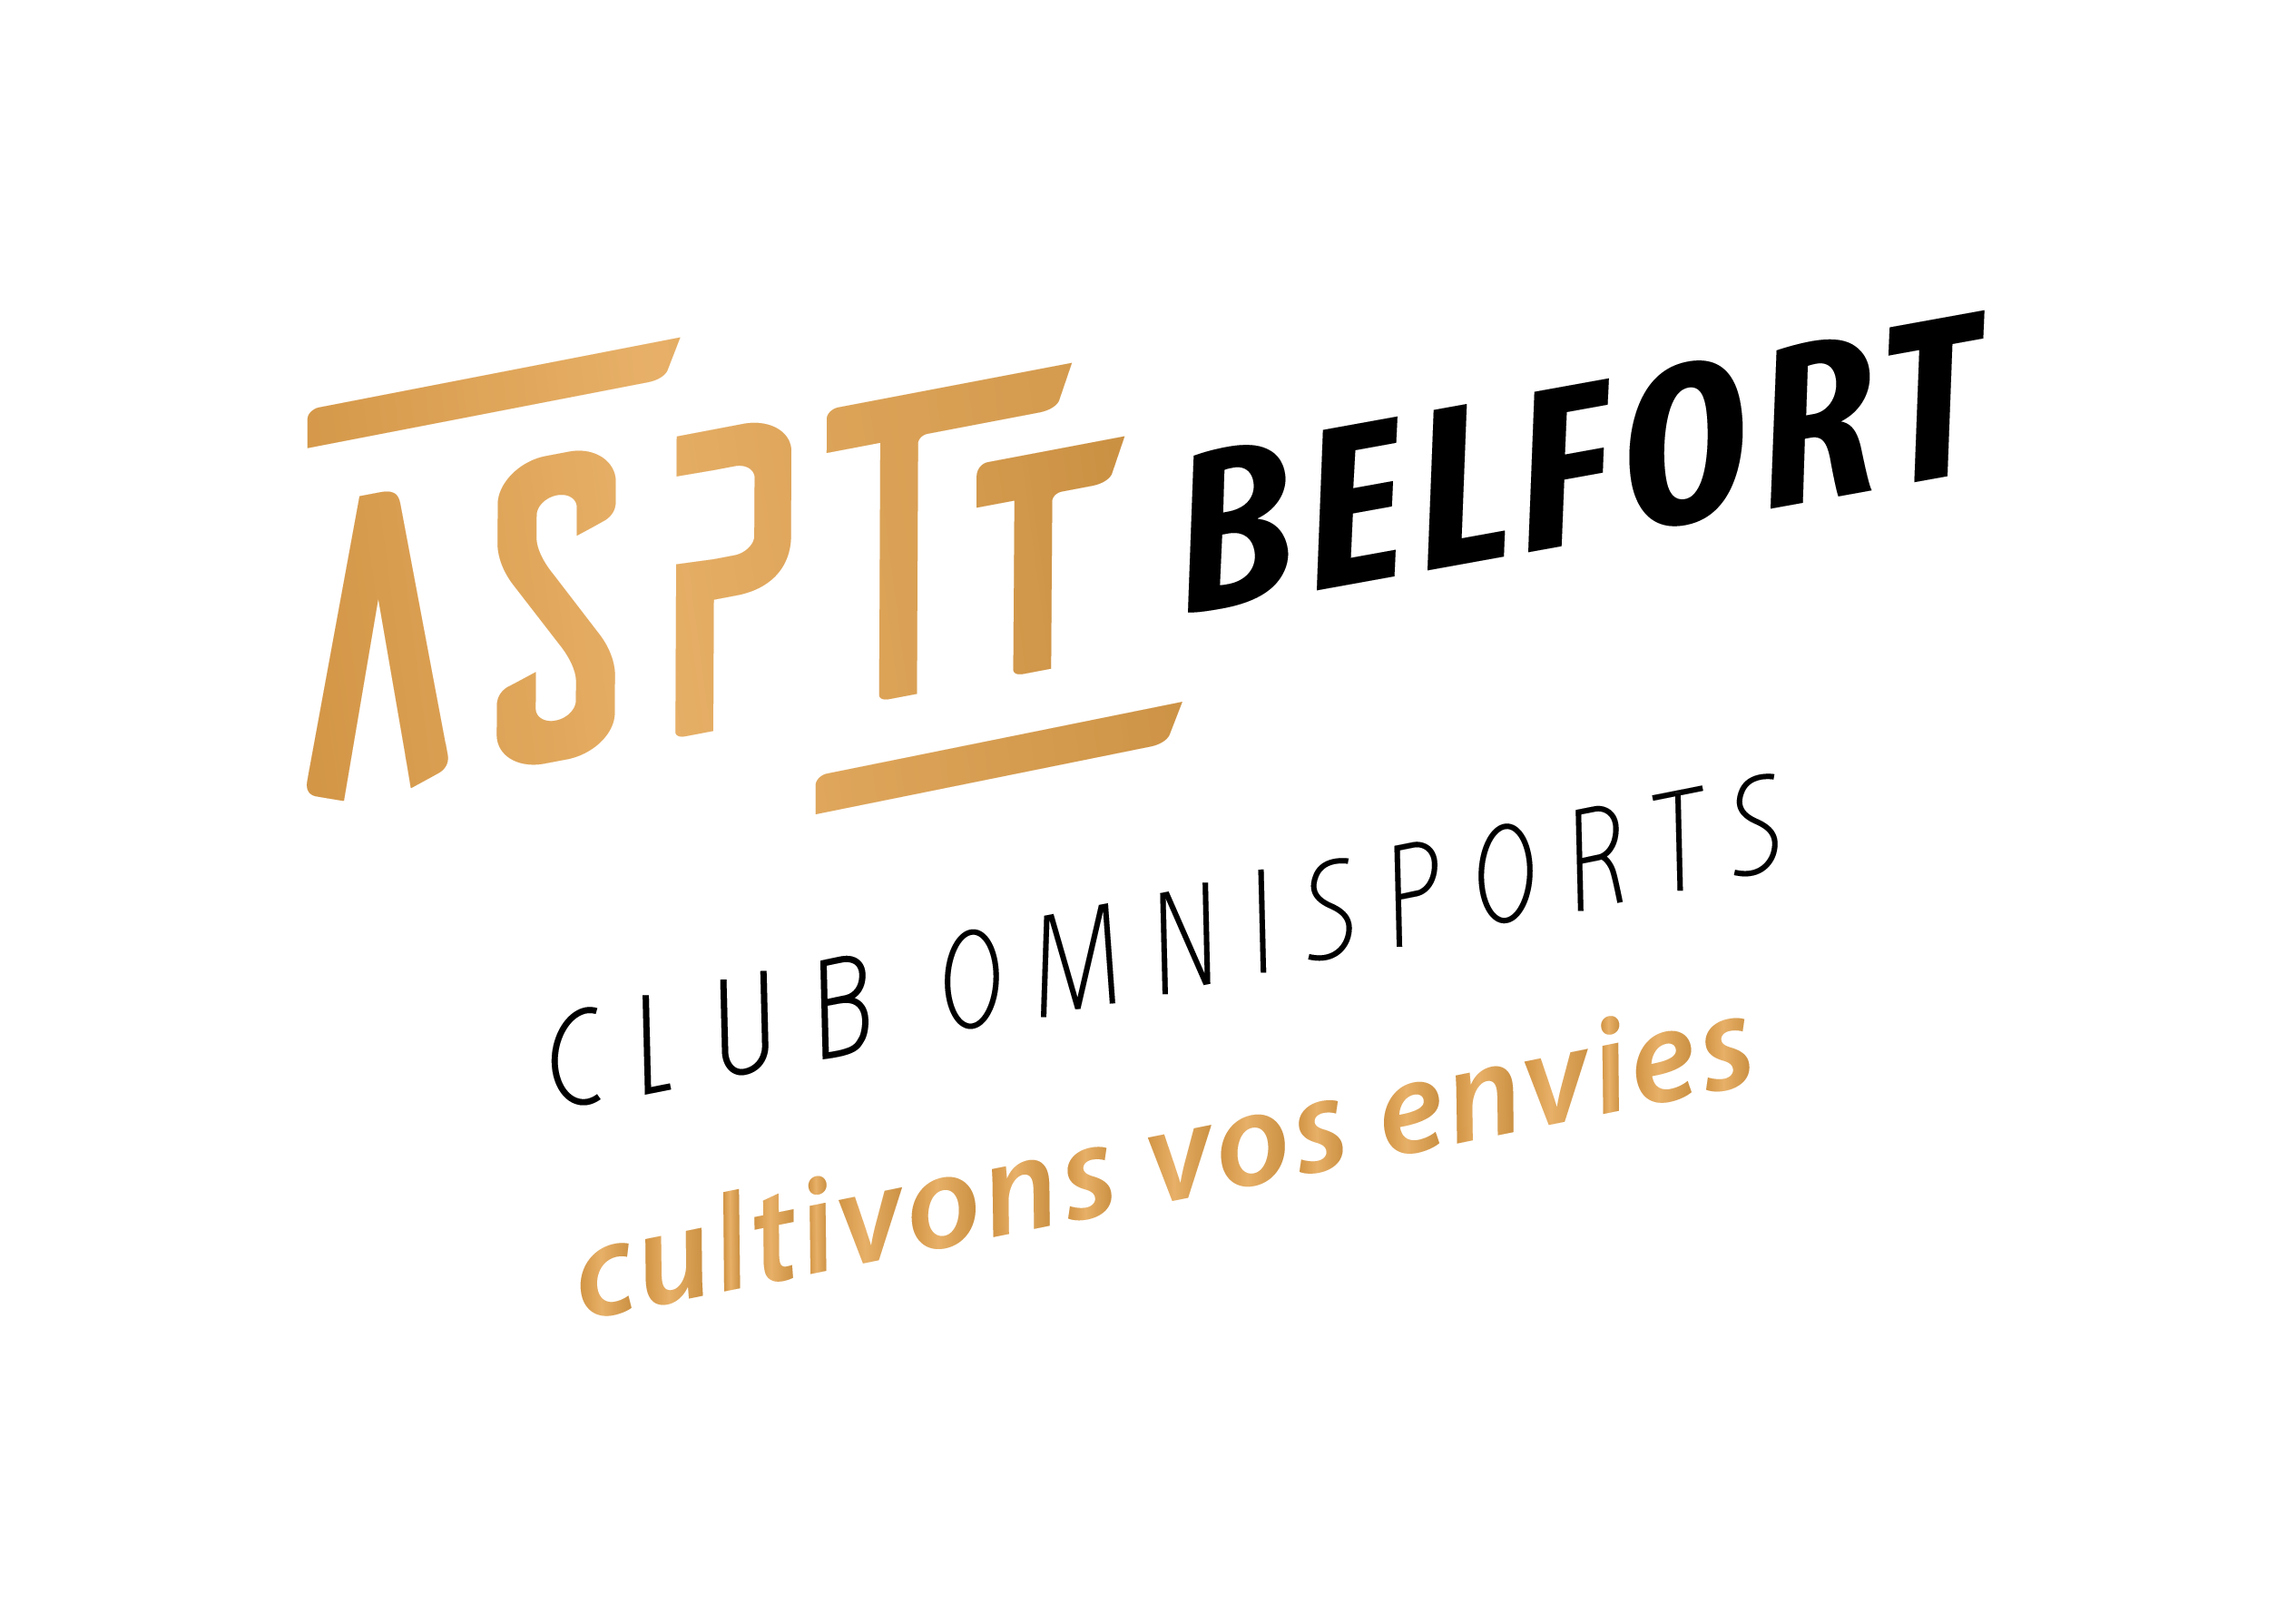 ASPTT Belfort